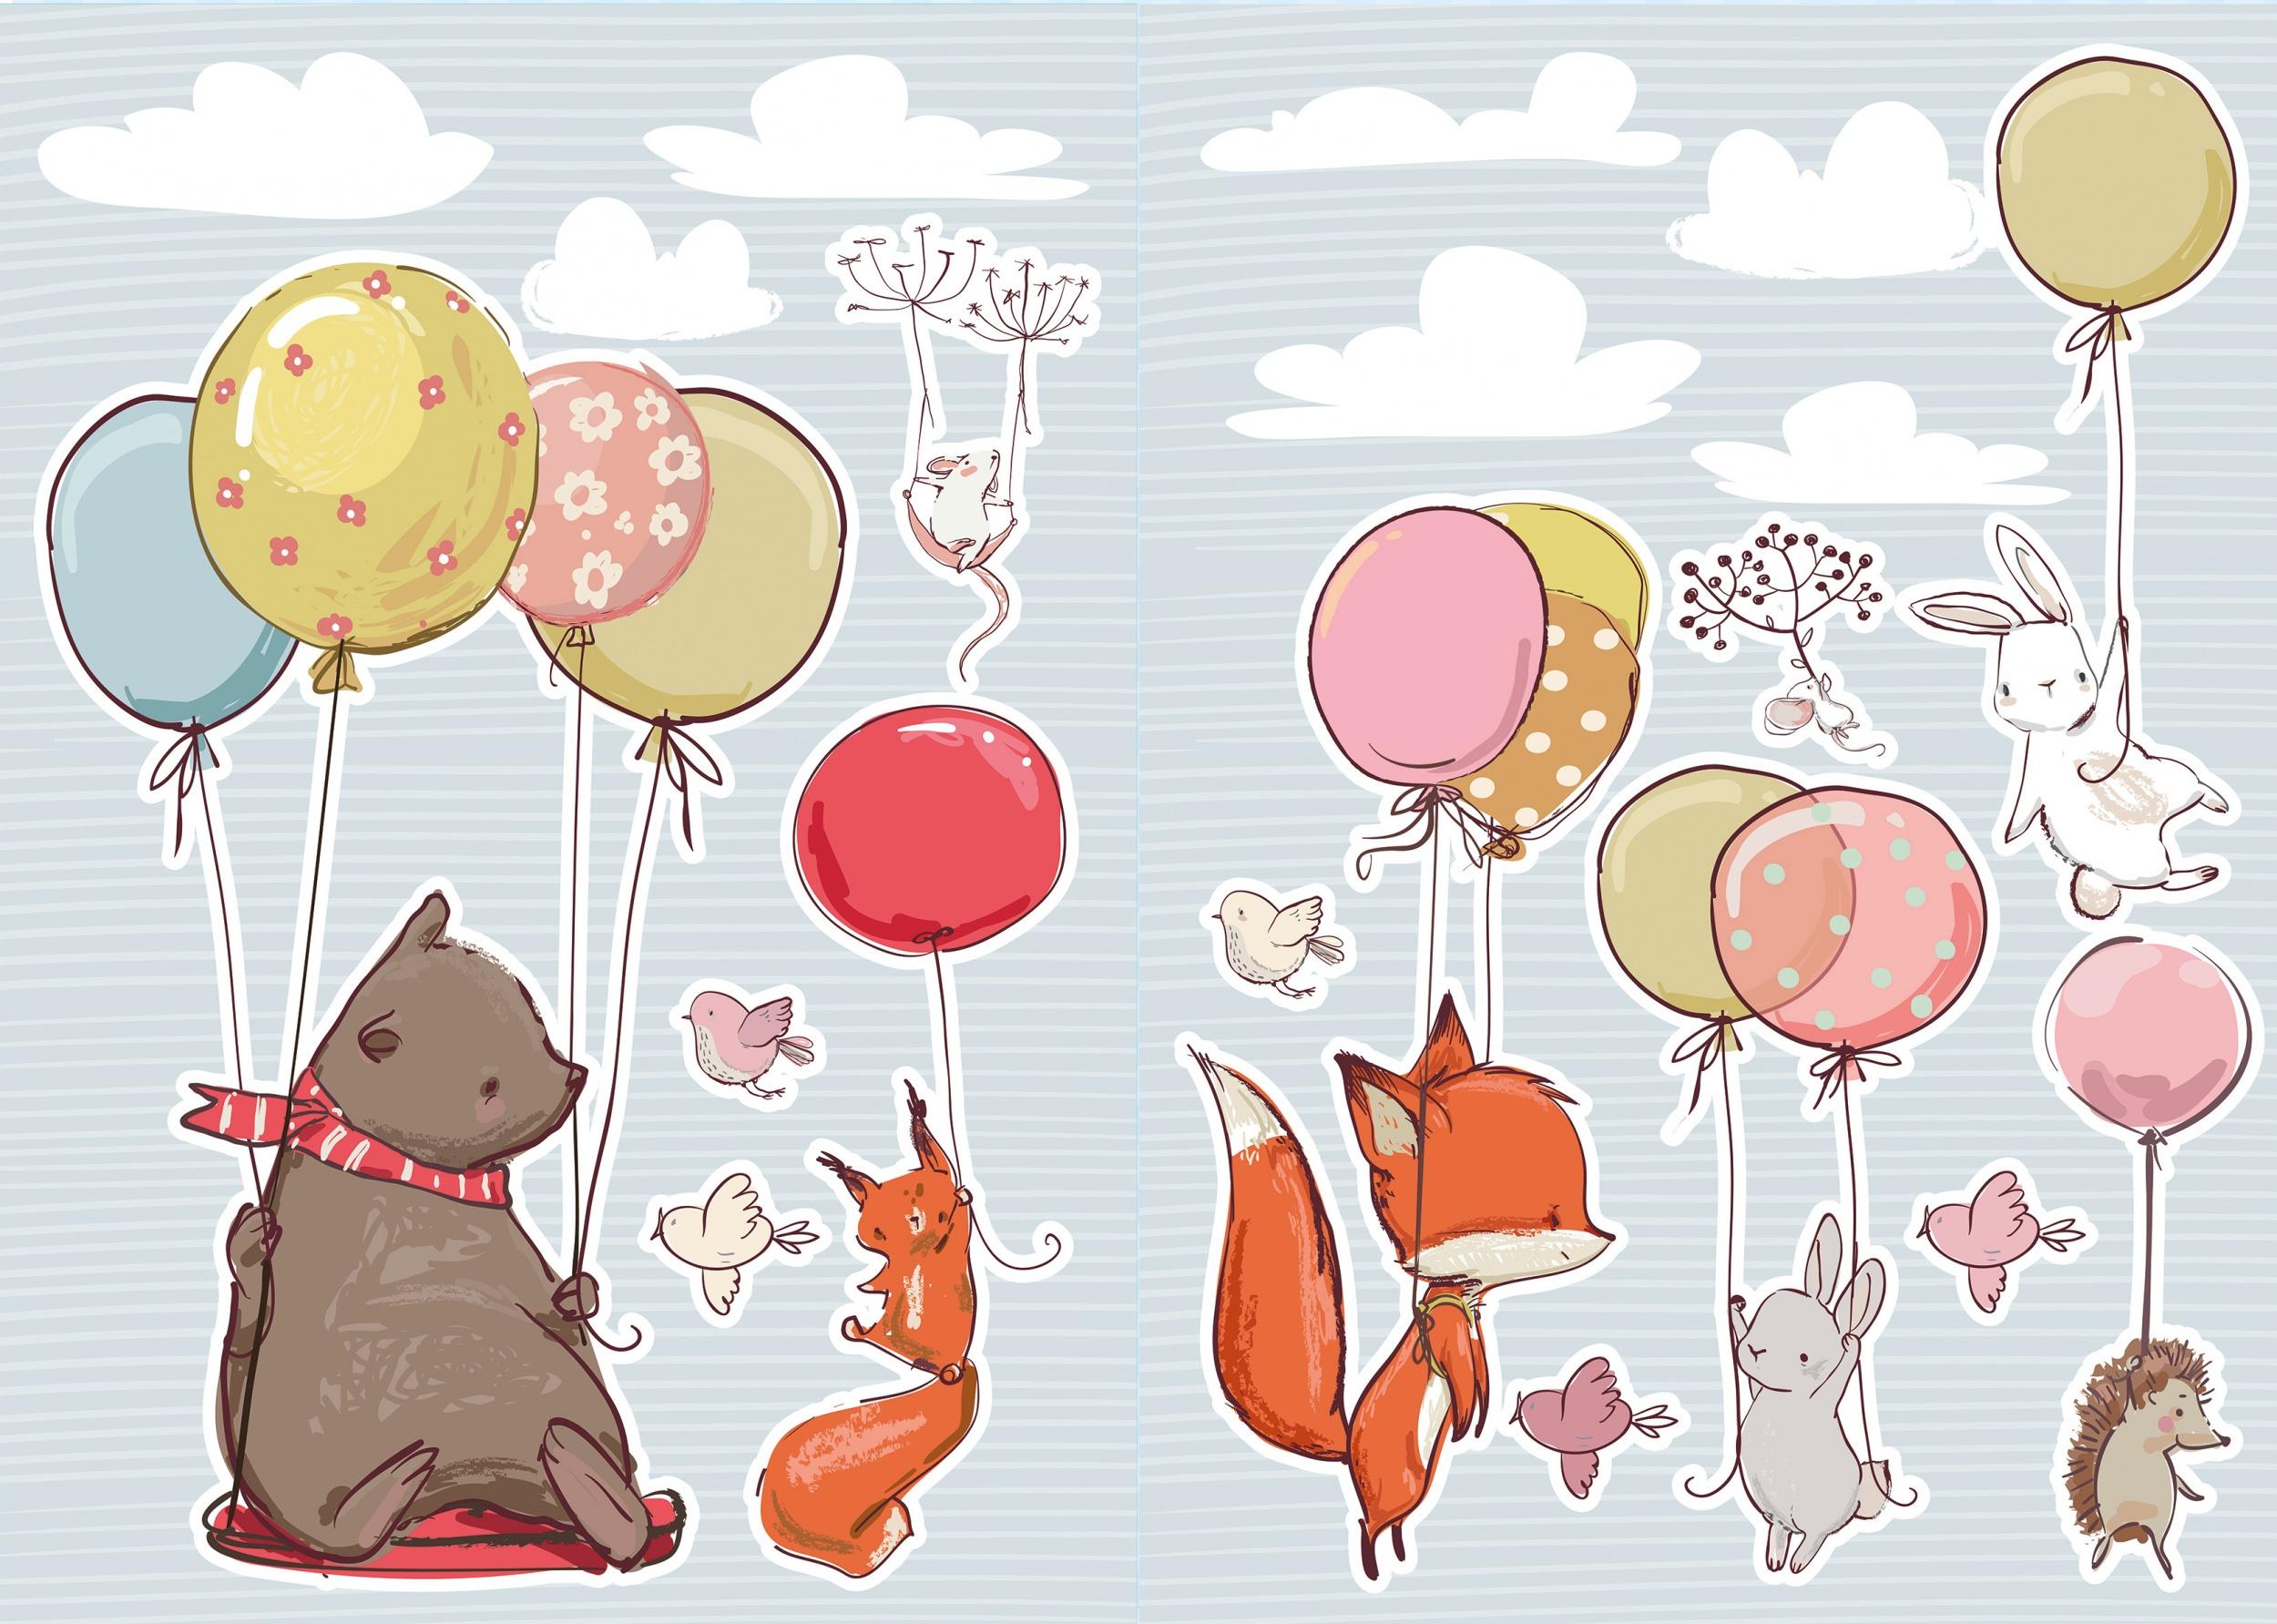 Muurstickers Den Haag.Kids Decor Wall Stickers Flying Animals 20 Piece Internet Toys